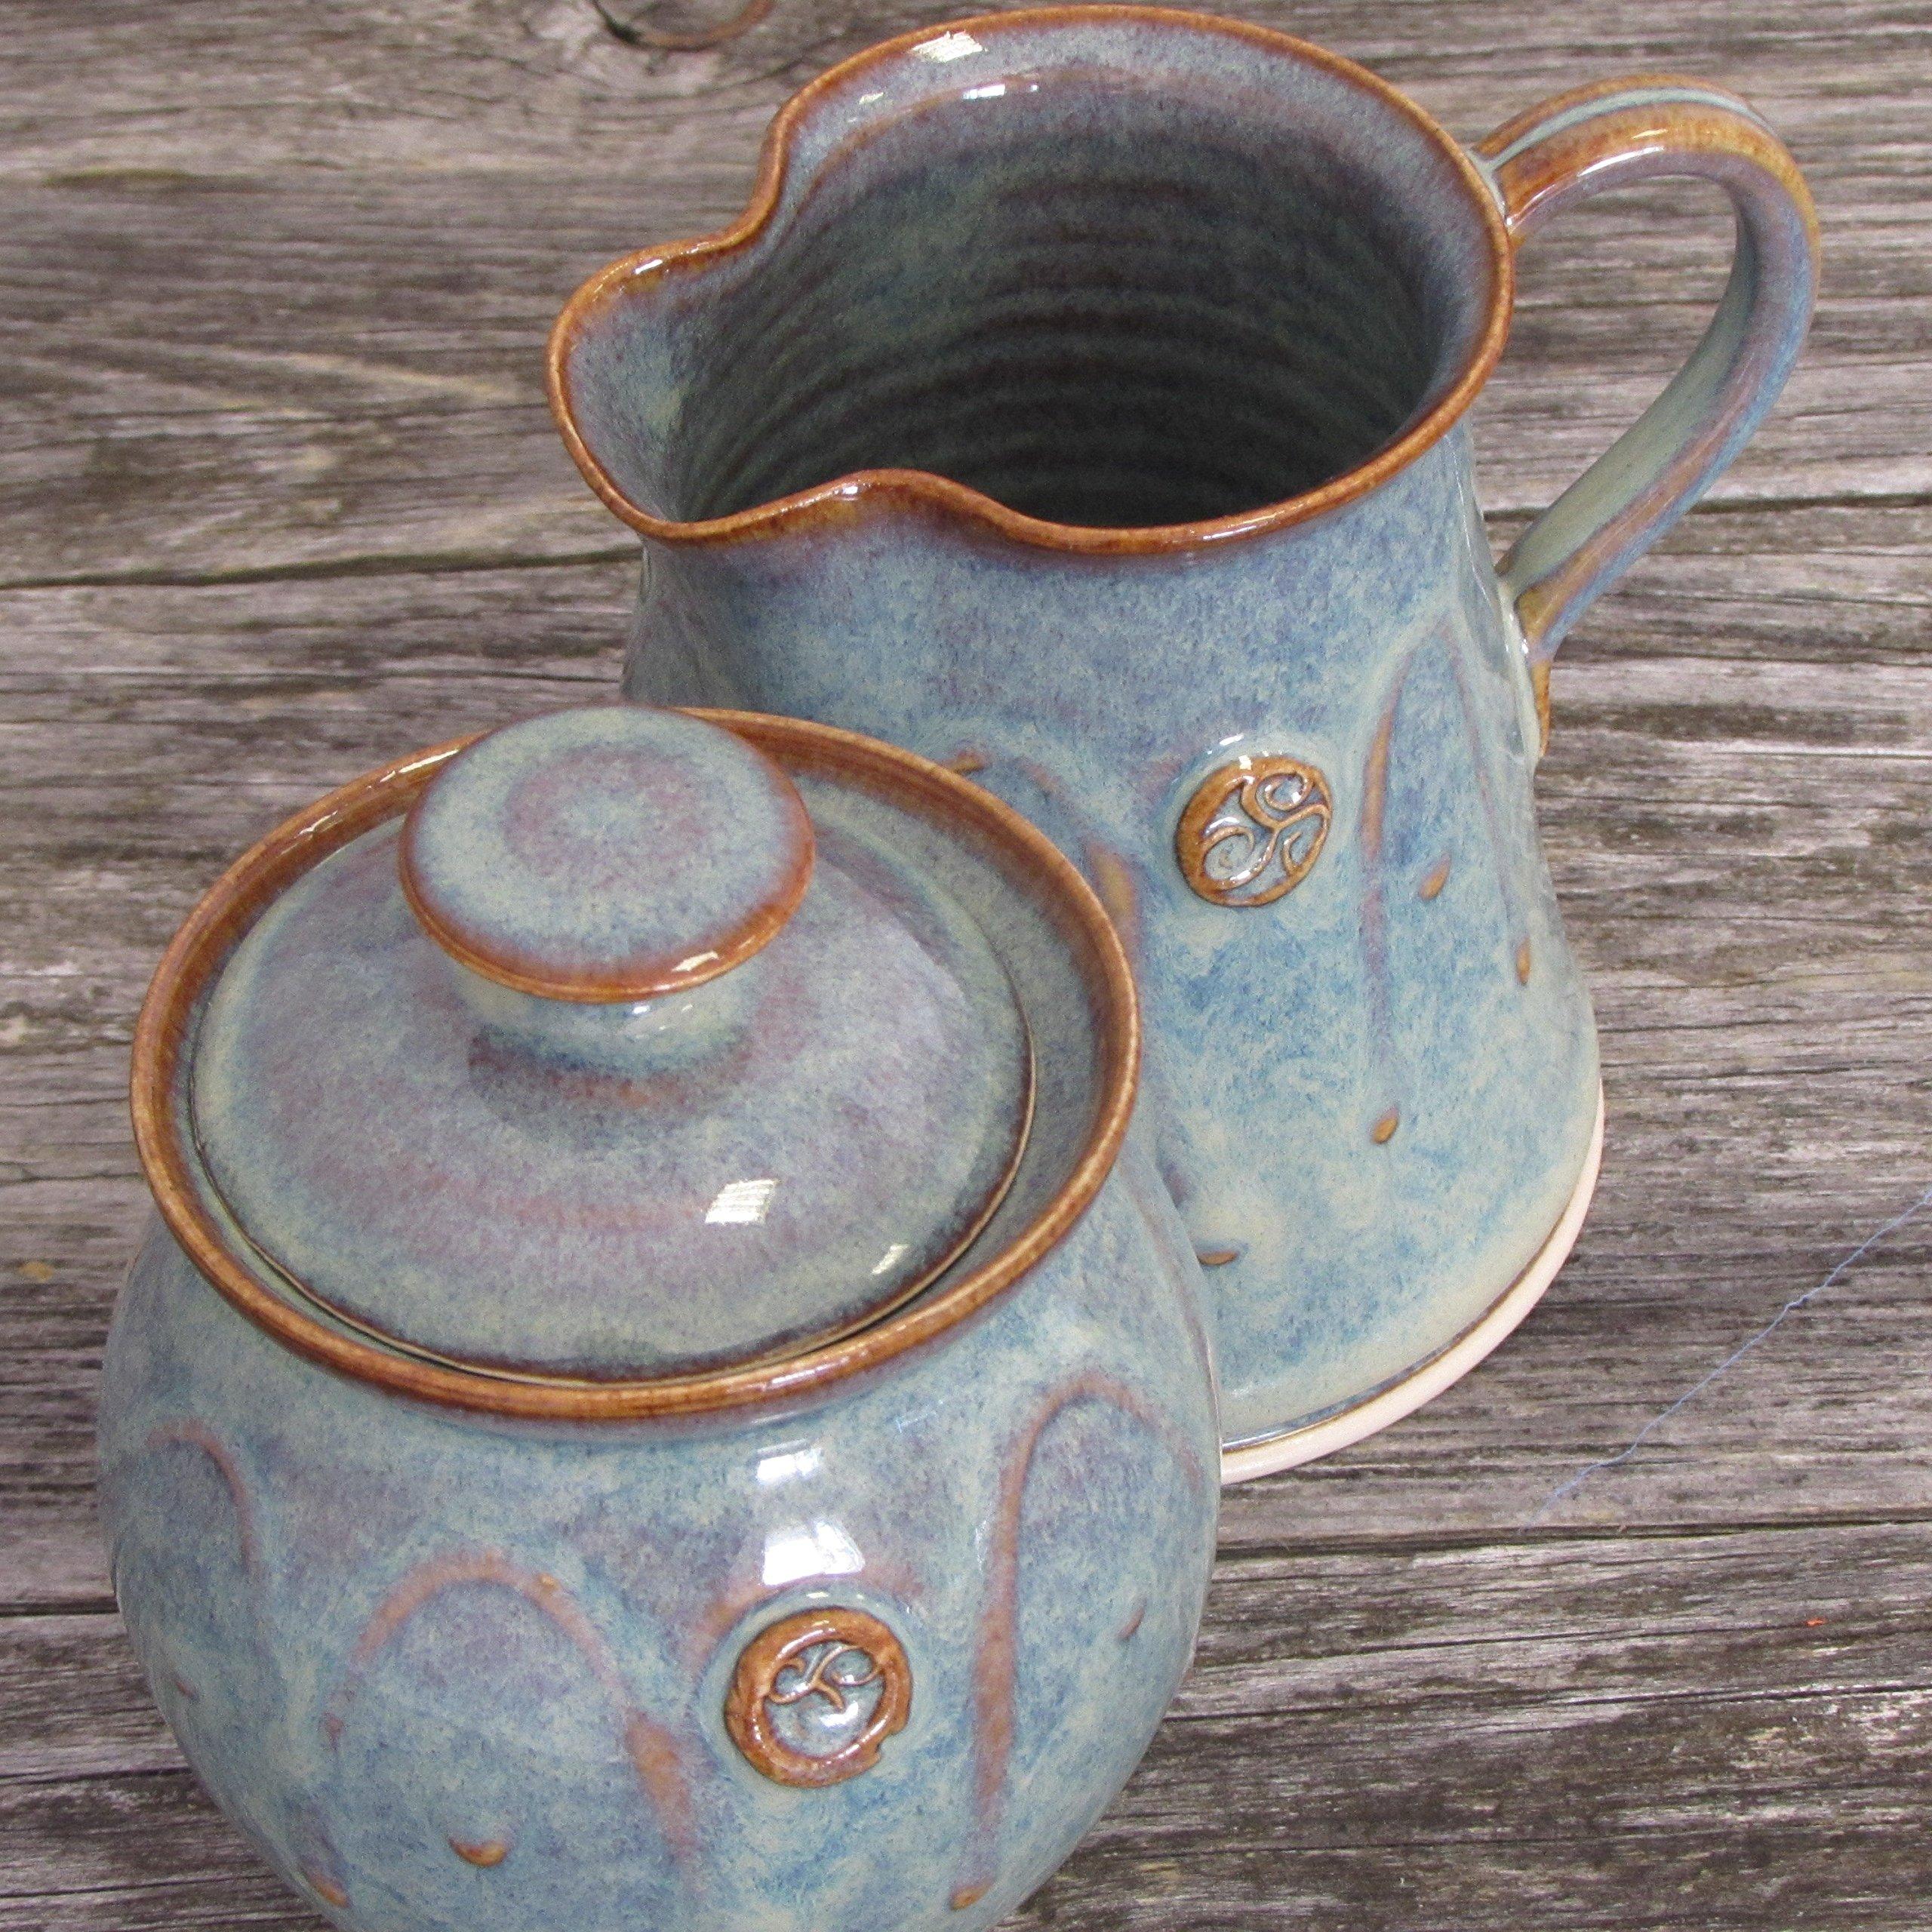 Handmade Irish Pottery Sugar and Creamer Set by Castle Arch Pottery Ireland (Image #5)